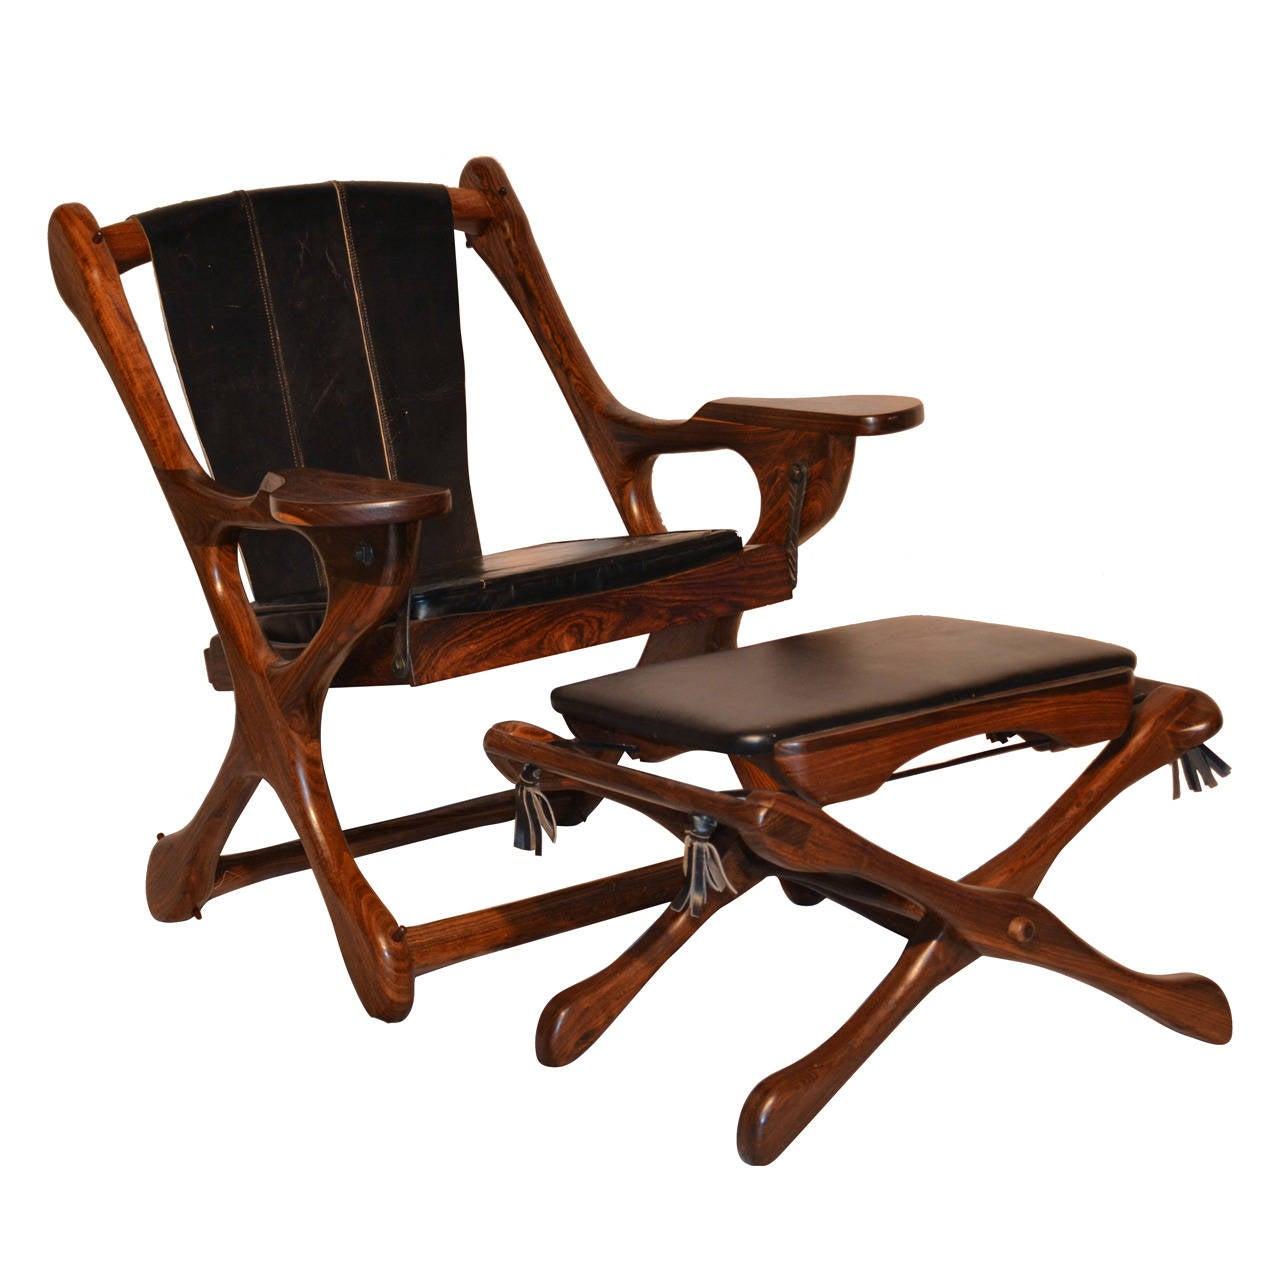 "Original Don Shoemaker Sling ""Swinger"" Chair and Ottoman, 1960s"